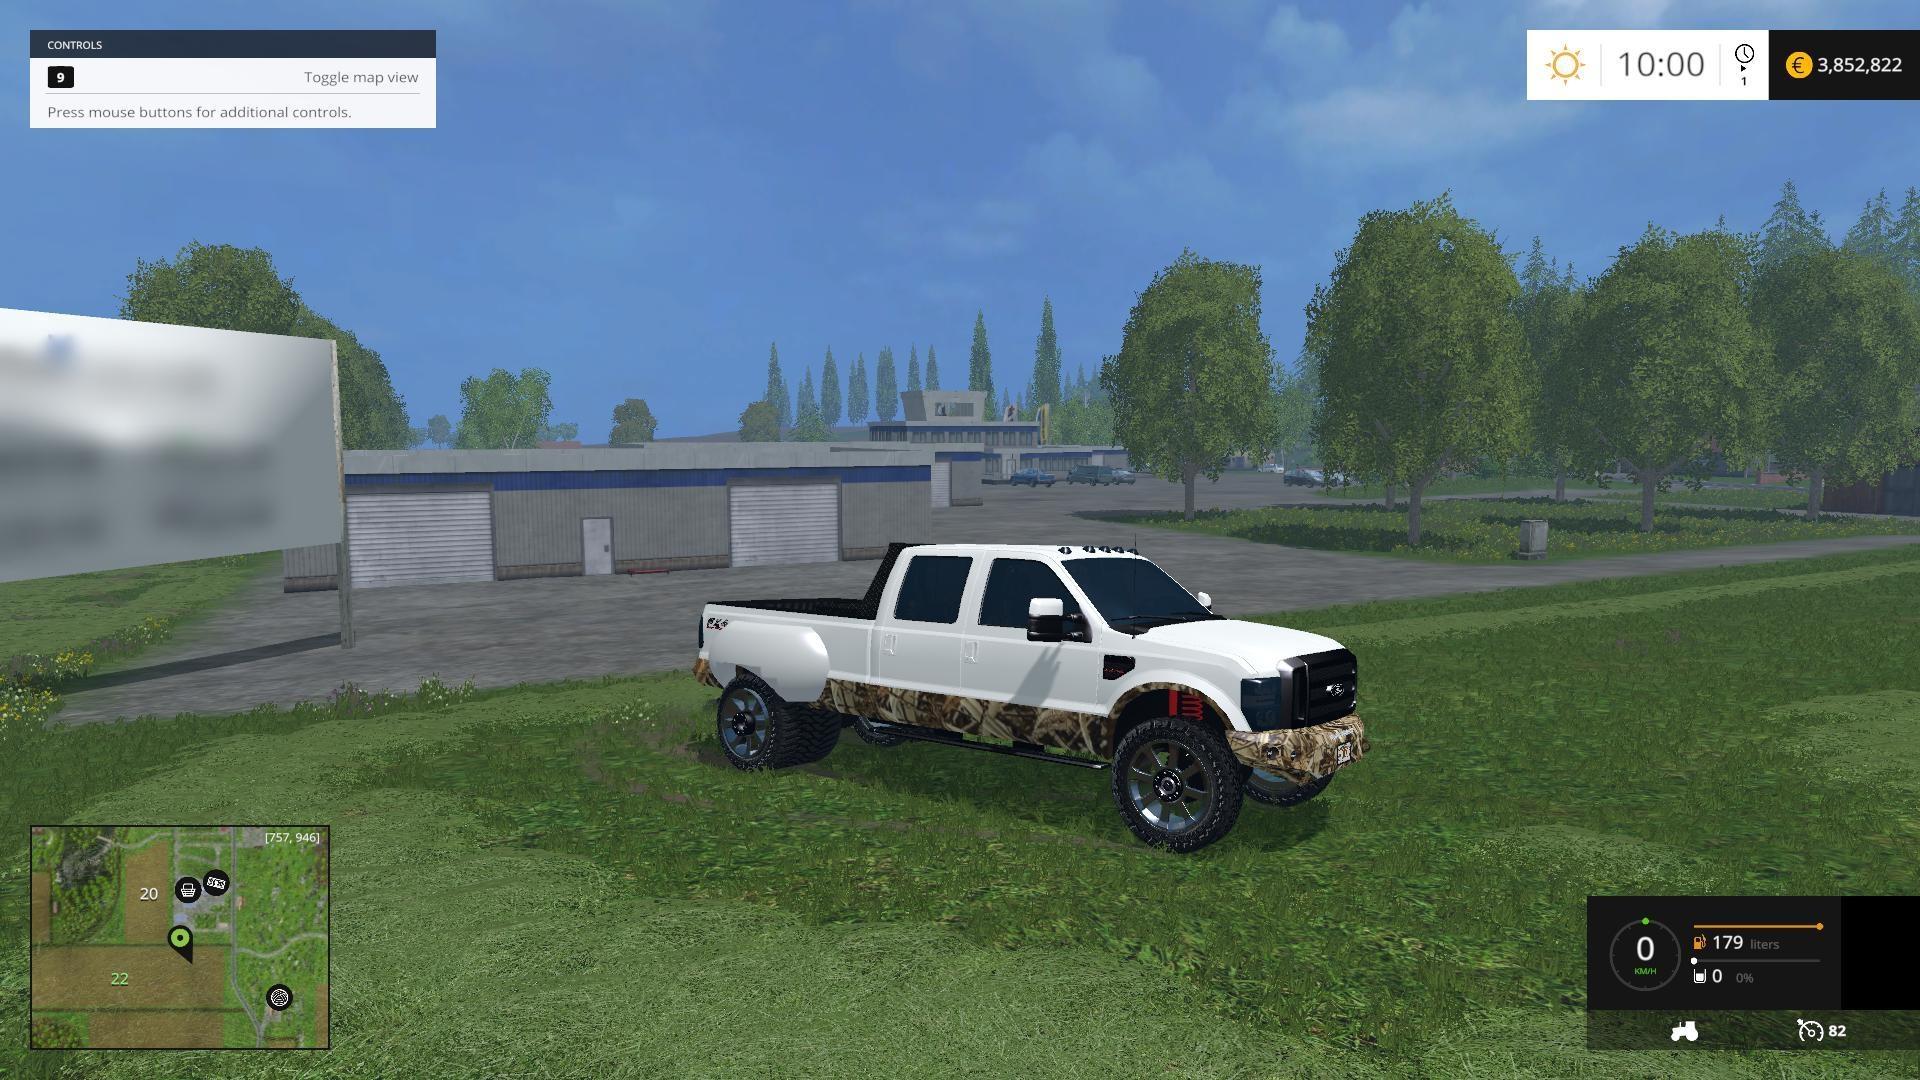 FS 15 Cars - Farming simulator 19, 17, 15 mods | FS19, 17